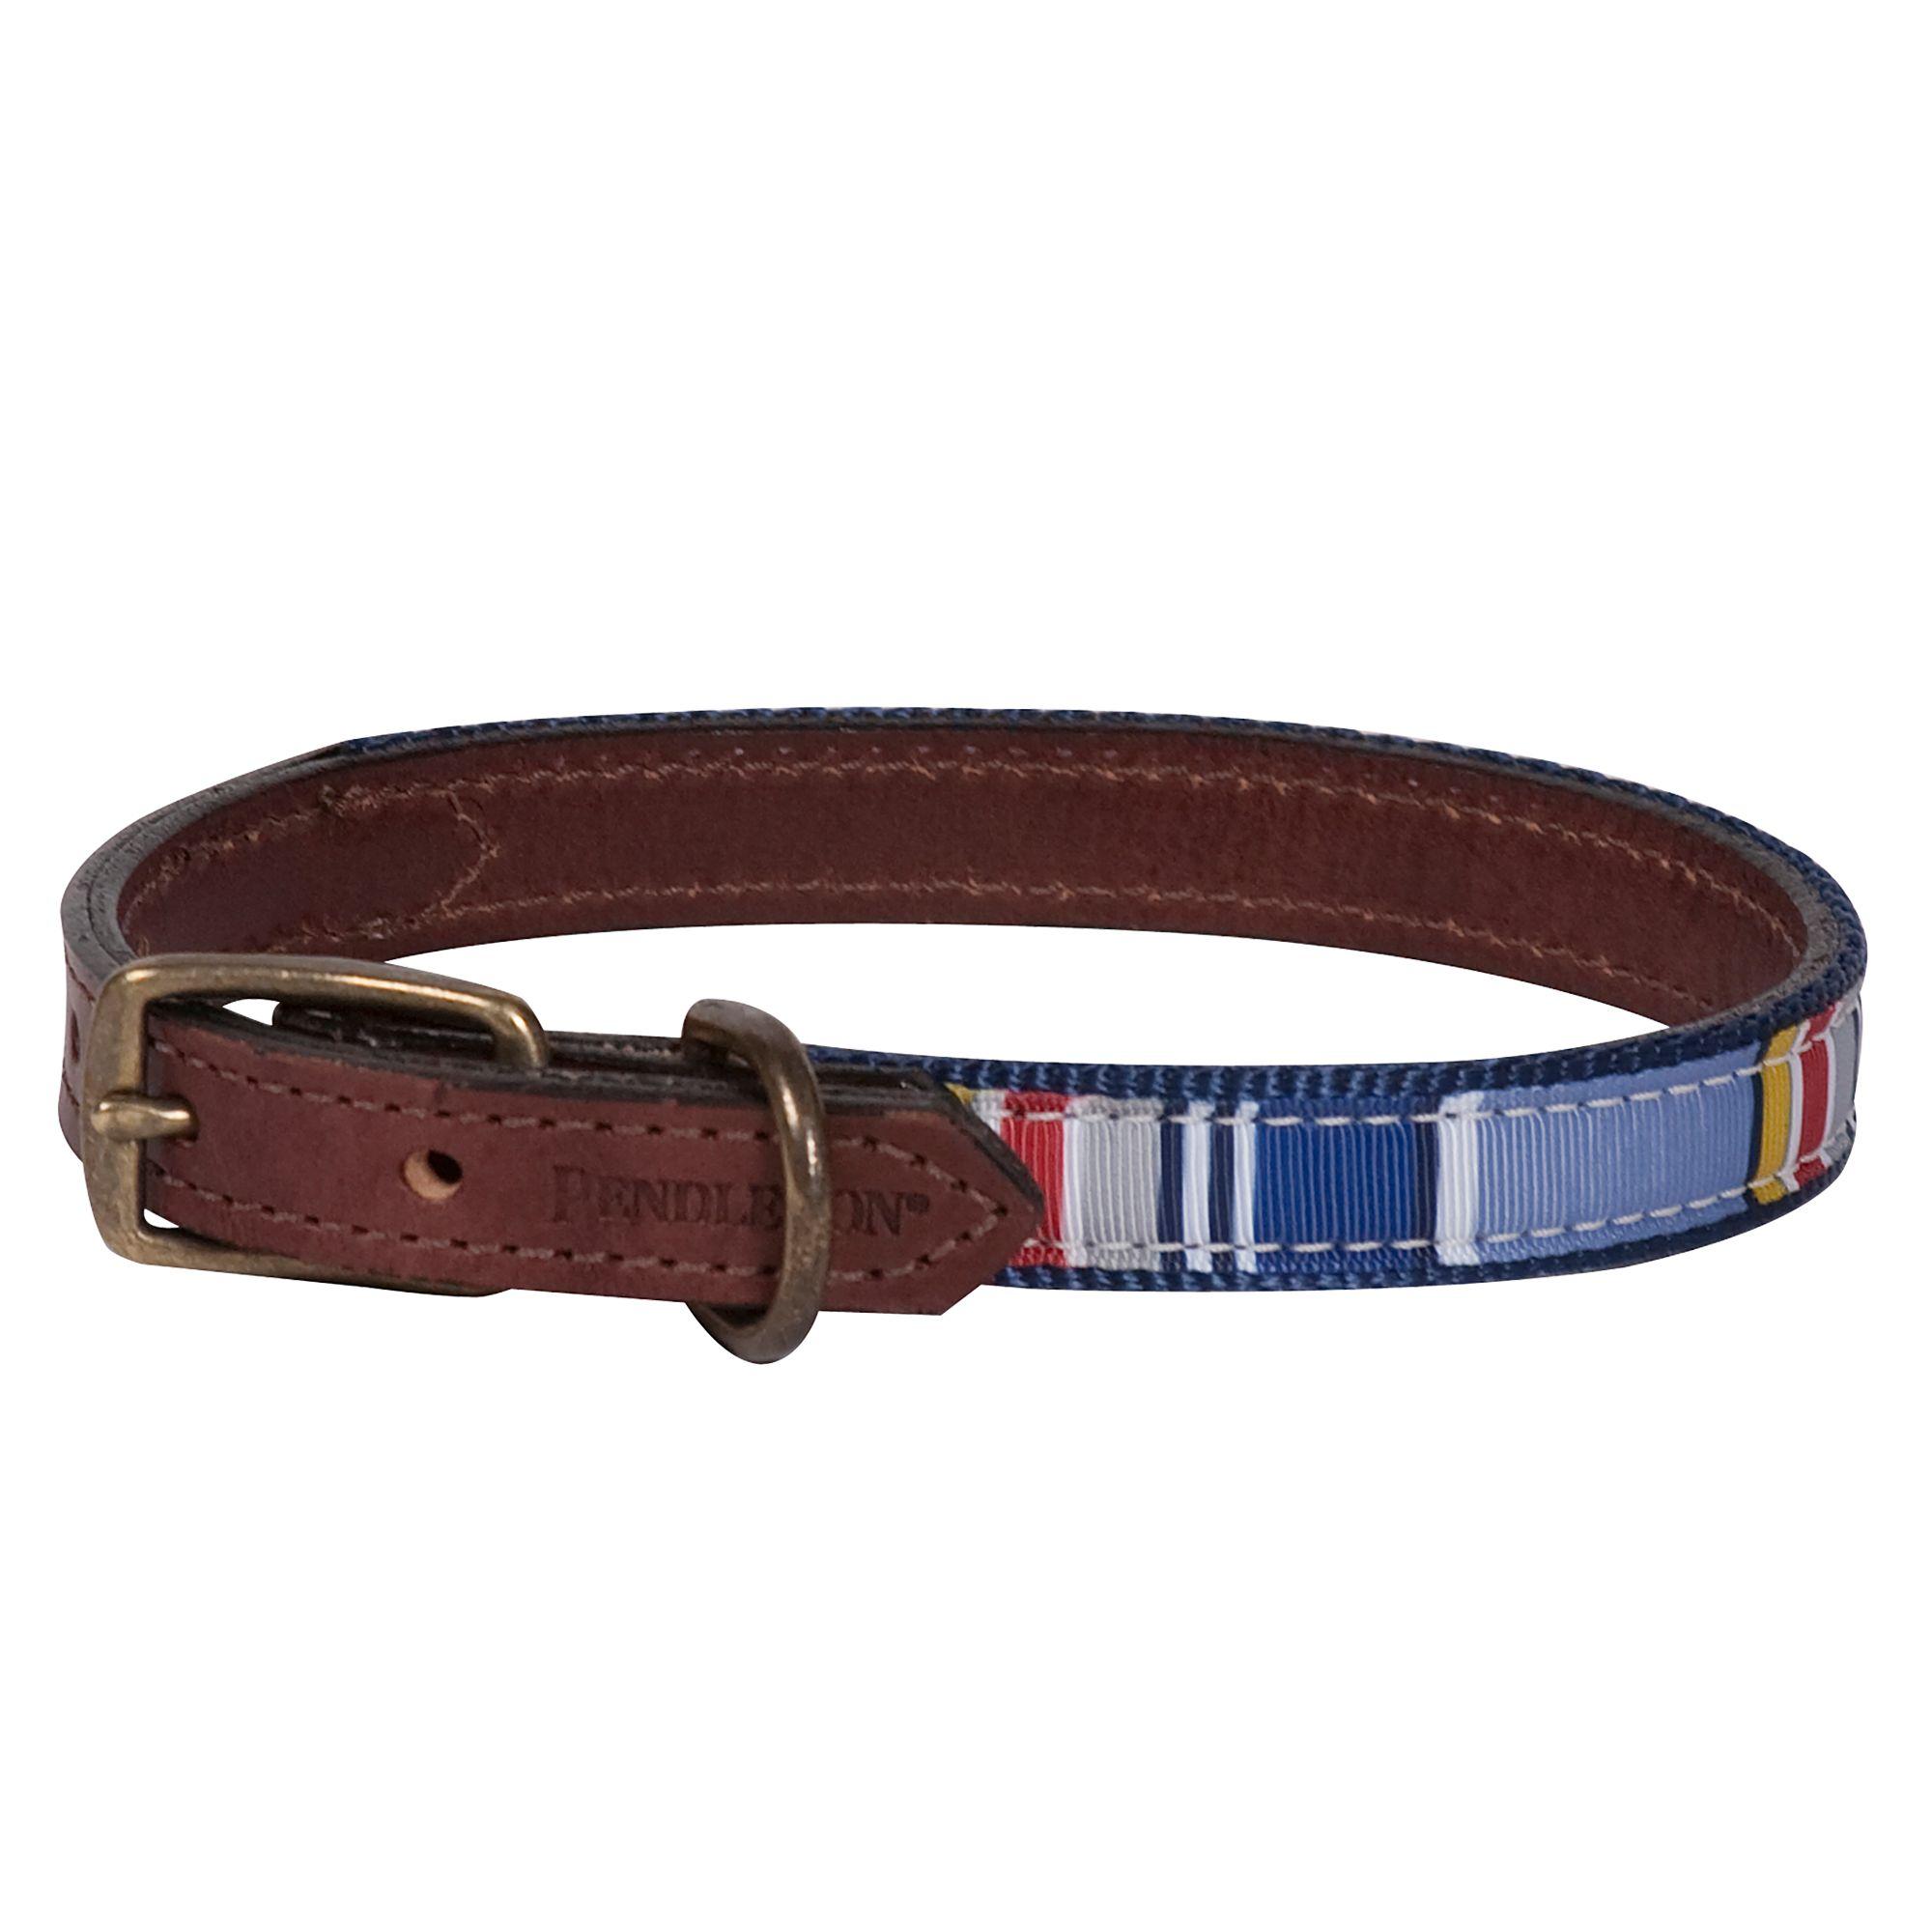 Pendleton National Park Yosemite Explorer Dog Collar size: Small 5263165